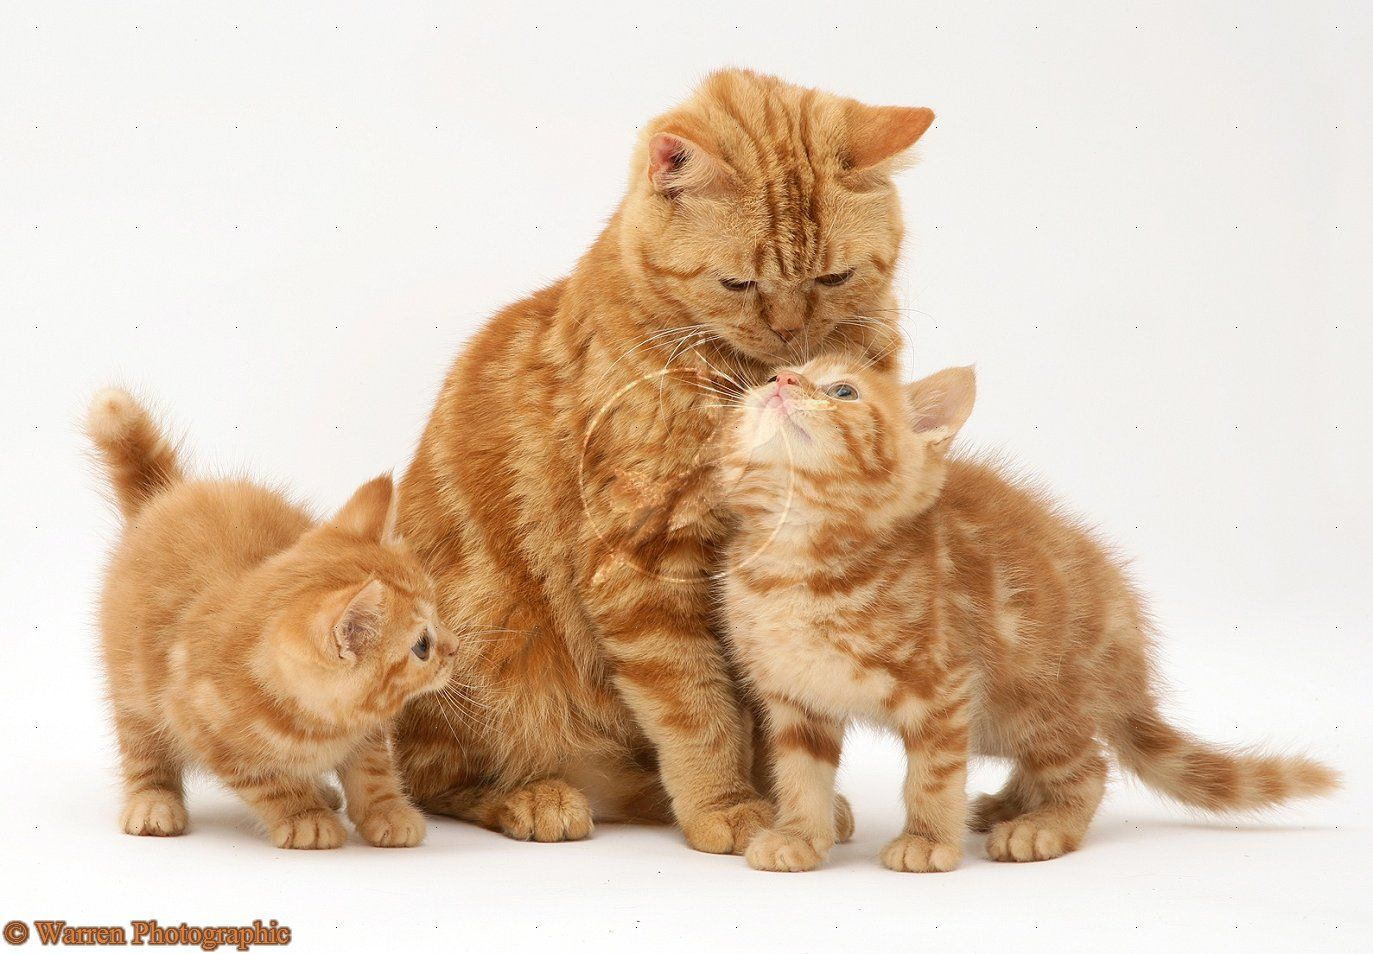 Cats And Kittens Red Tabby British Shorthair Mother Cat And Kittens Photo Wp11779 Hubsche Katzen Katzen Schonen Katzen